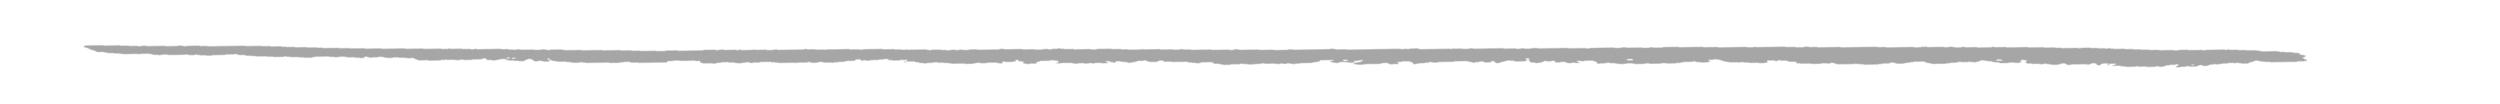 line1_grey.jpg